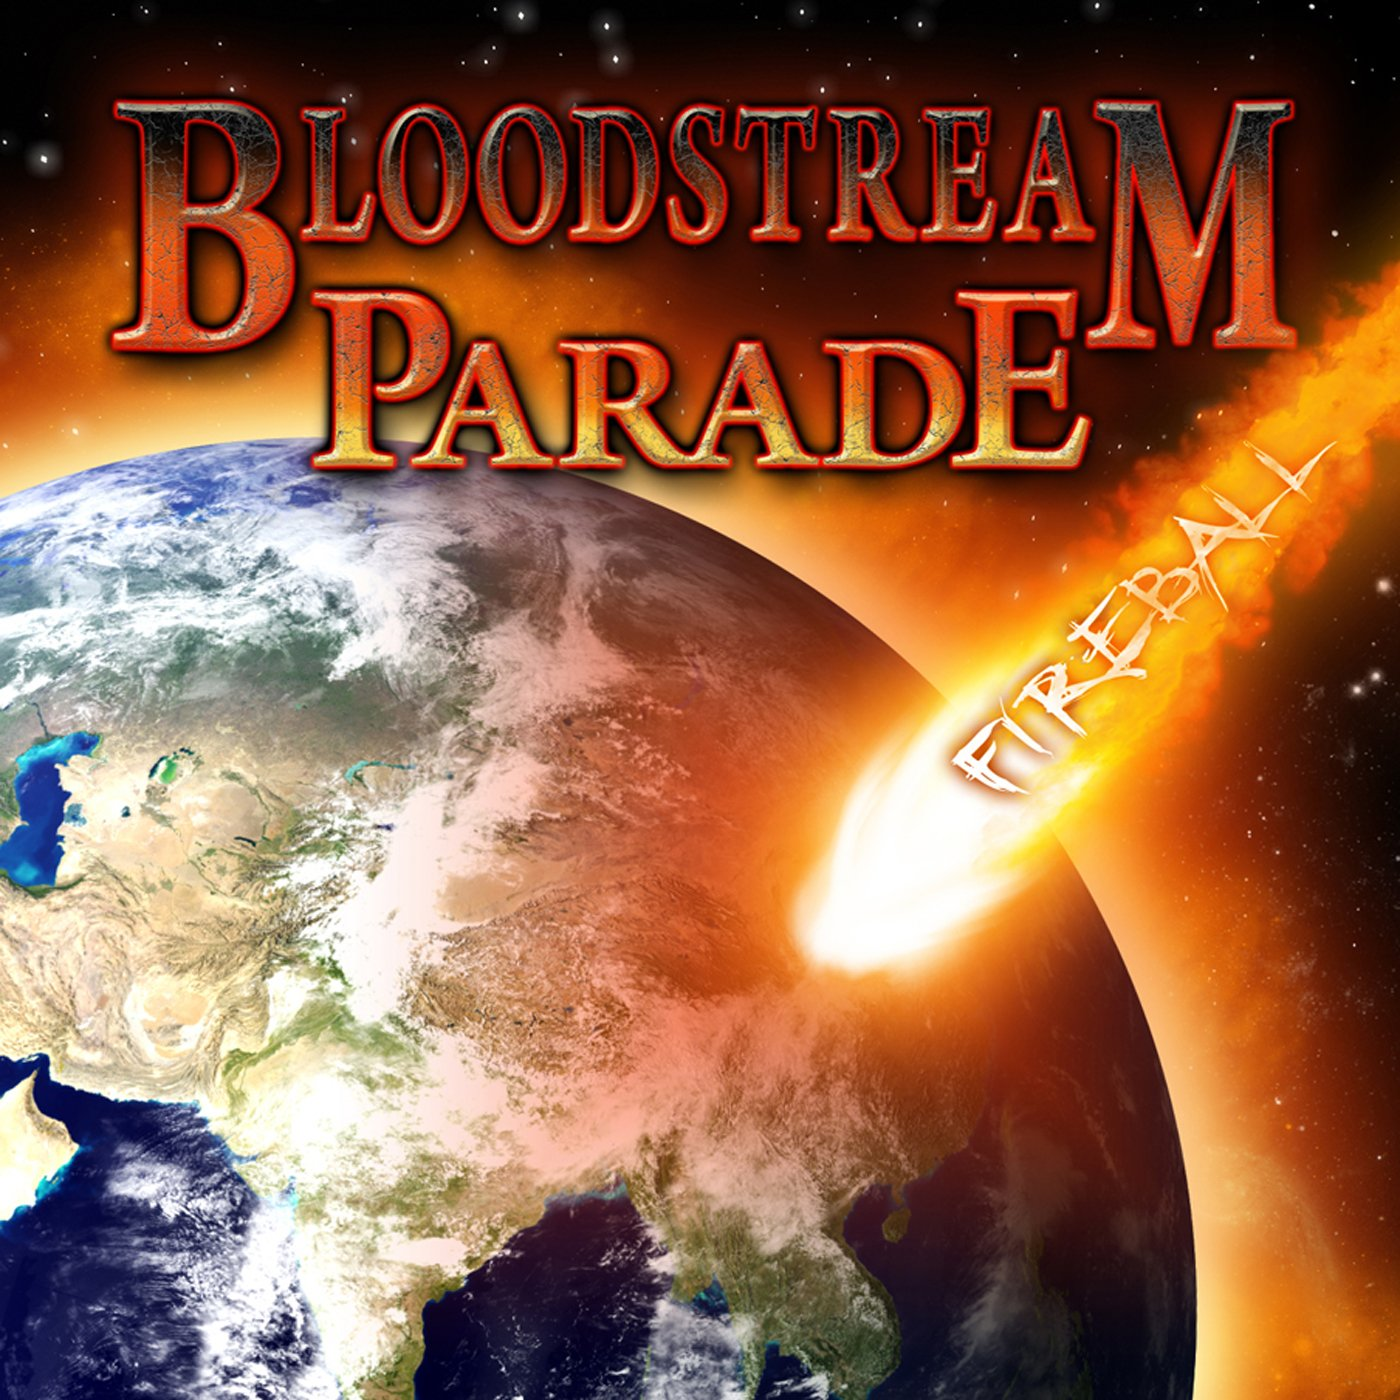 Fireball by Bloodstream Parade USB Wristband